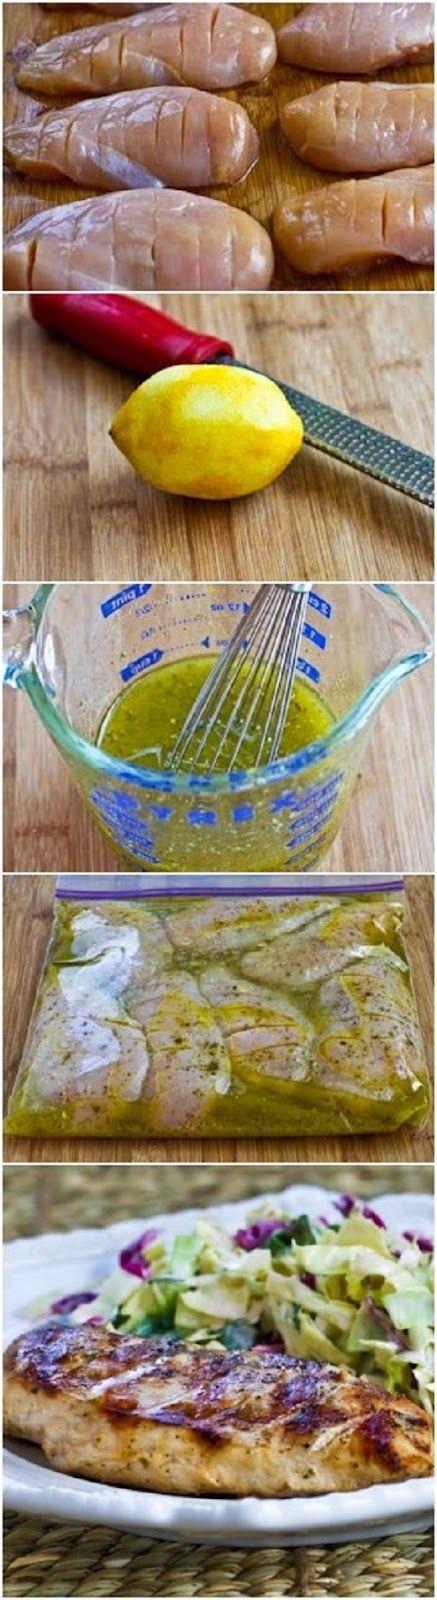 Exclusive Foods: Very Greek Grilled Chicken